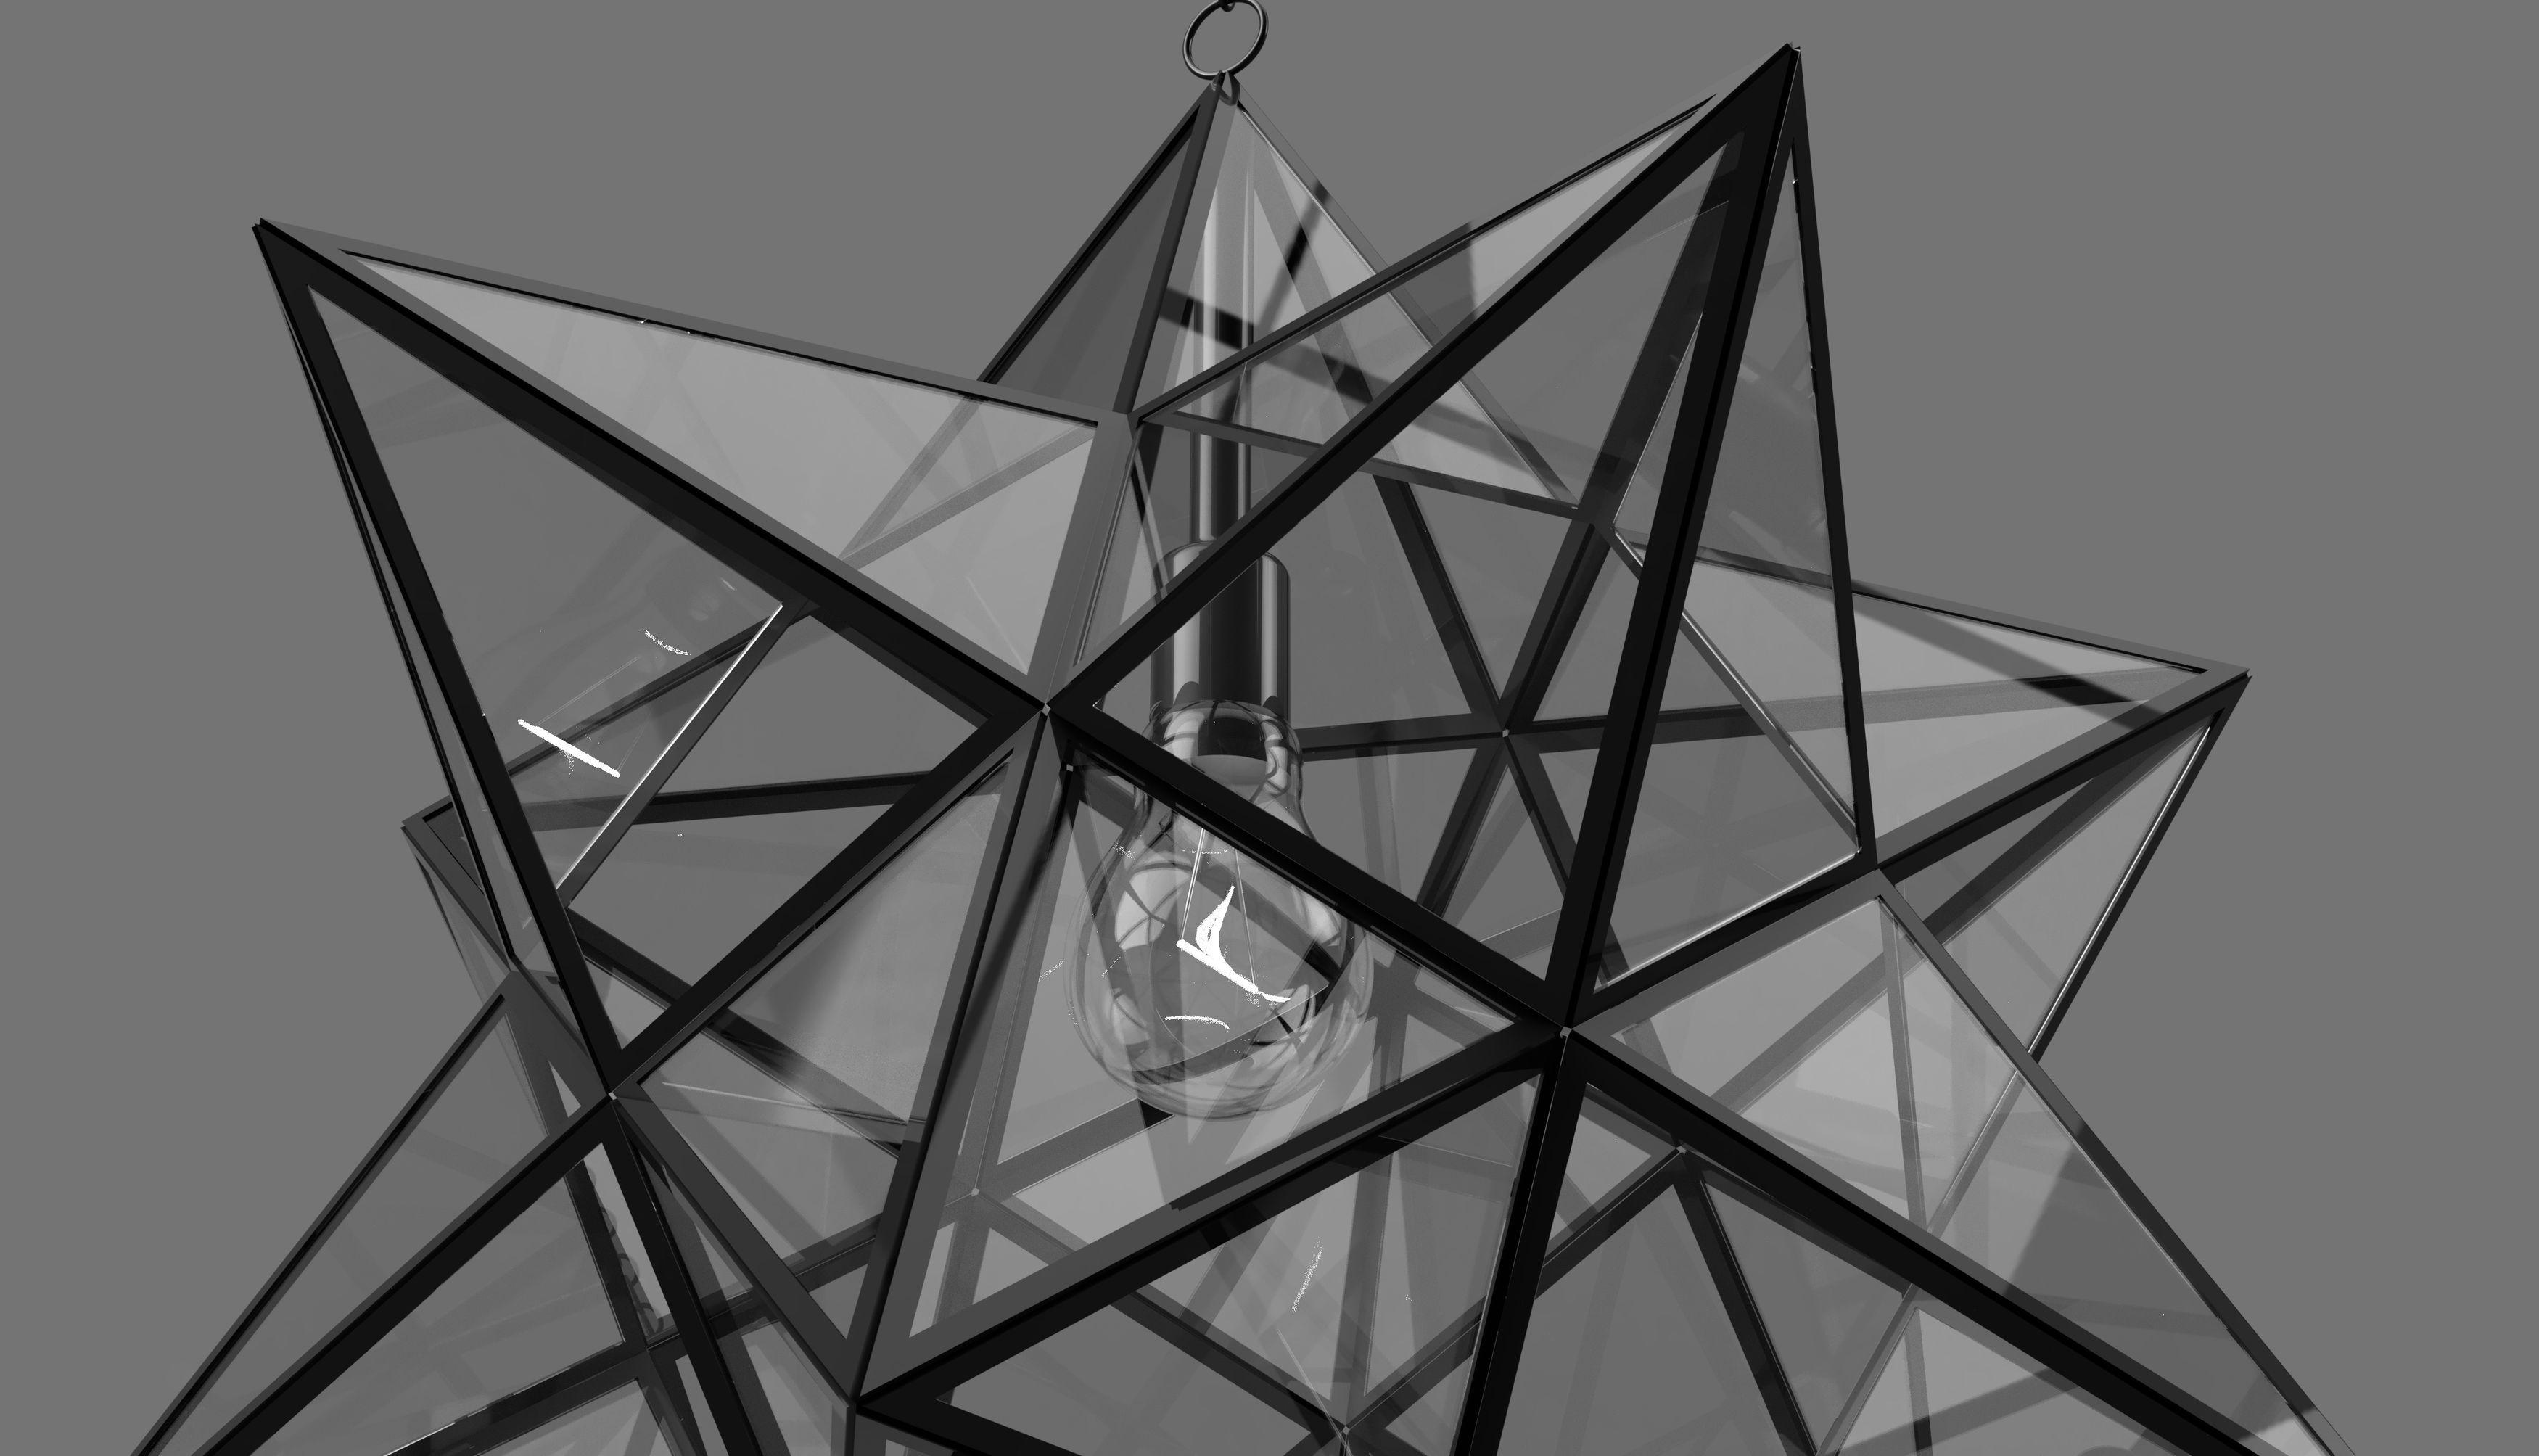 Stjarna-mindre-2019-apr-13-12-11-42am-000-customizedview59043801261-jpg-3500-3500